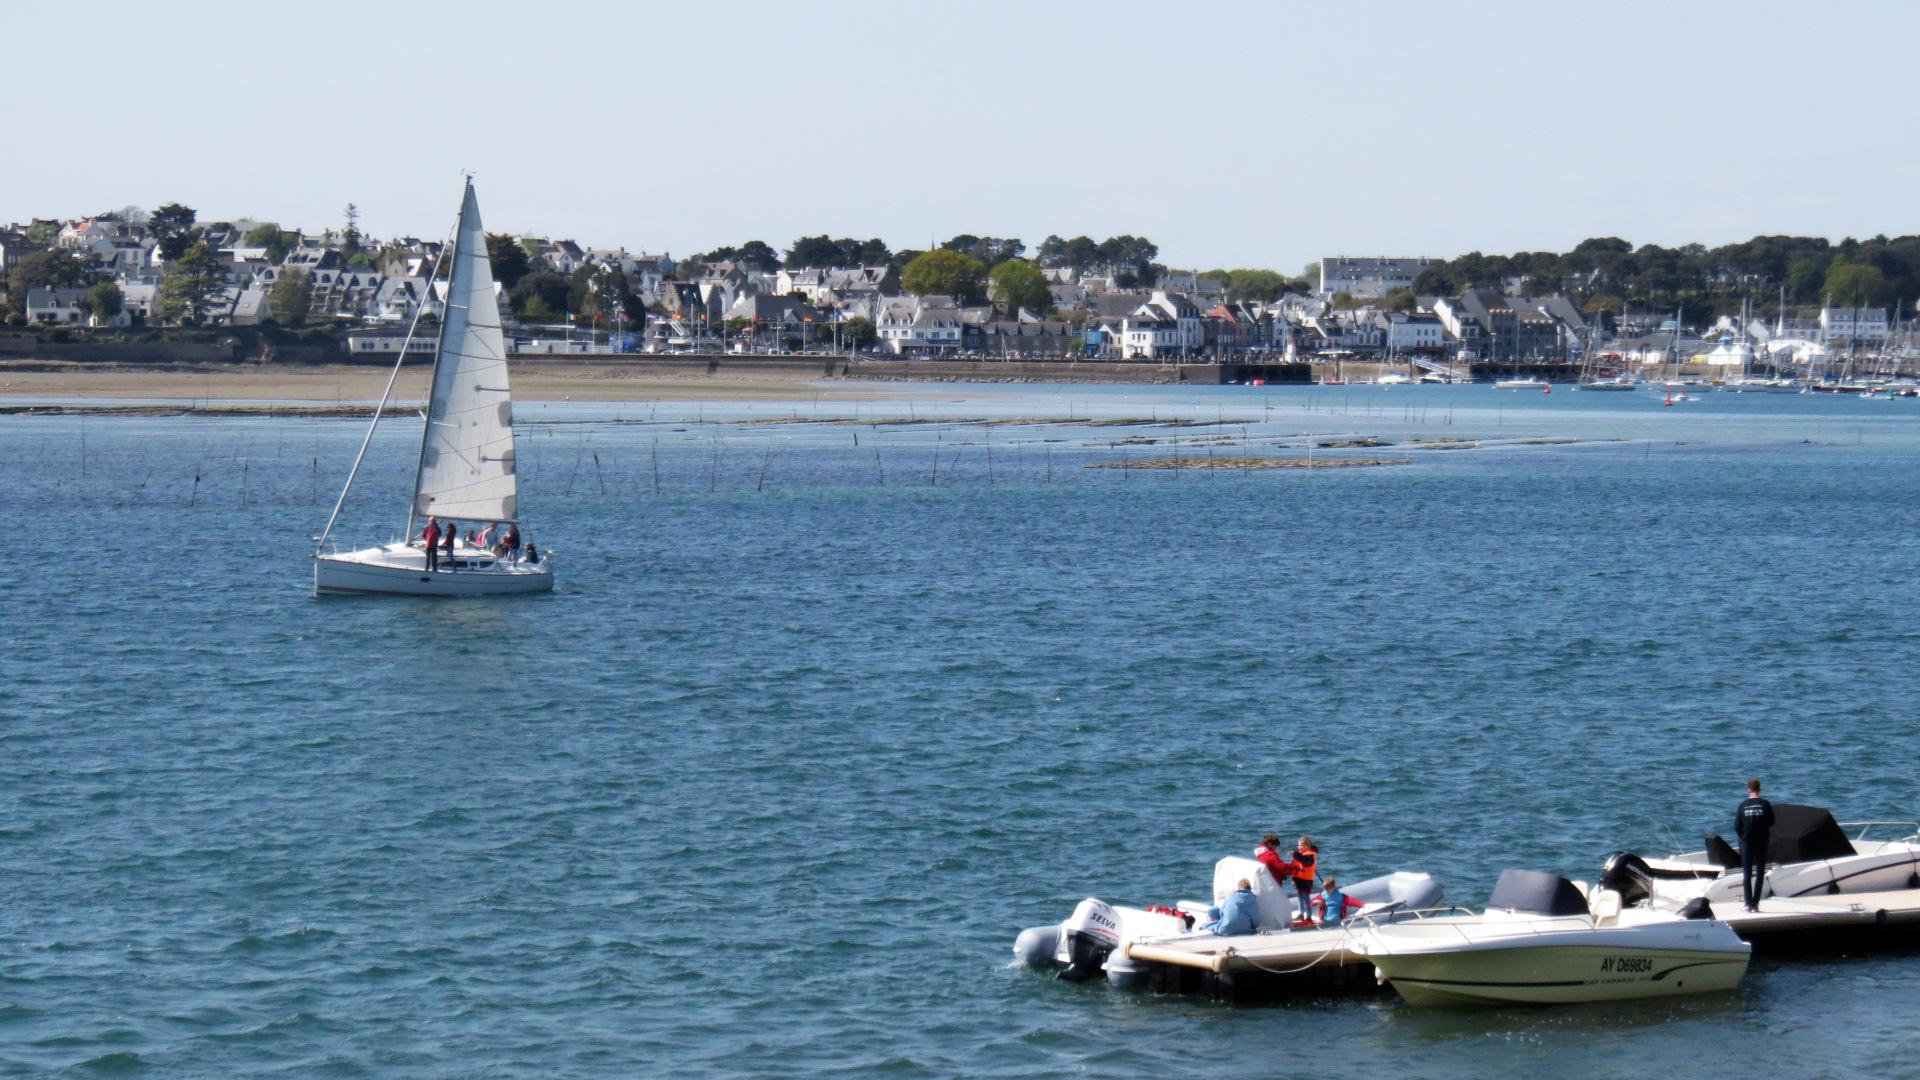 Saint Philibert Morbihan Dimanche De Paques Le Bord De Mer Oceanique